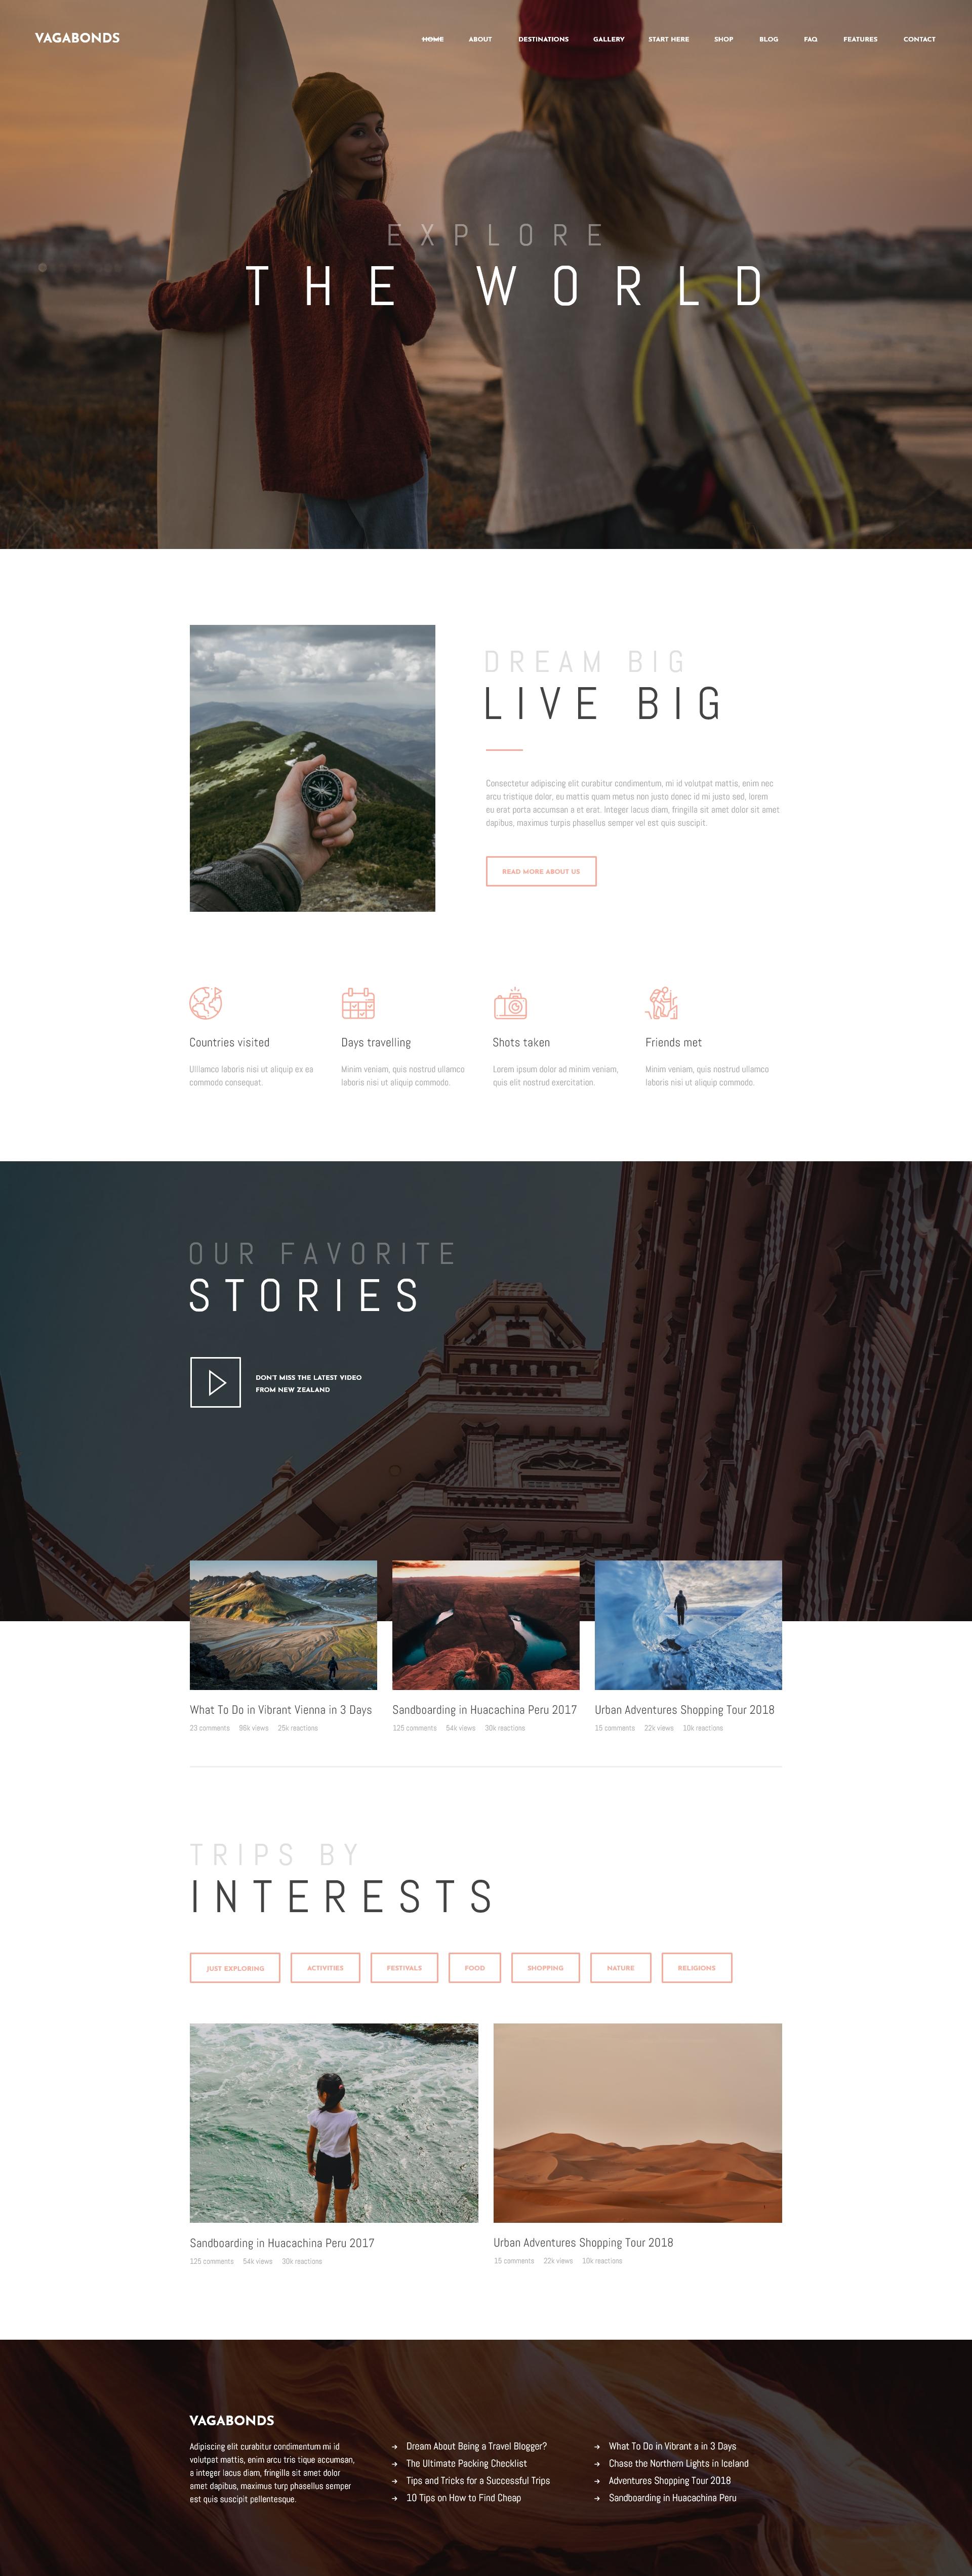 Vagabonds - Travel Blog Template Kit by axiomthemes | ThemeForest